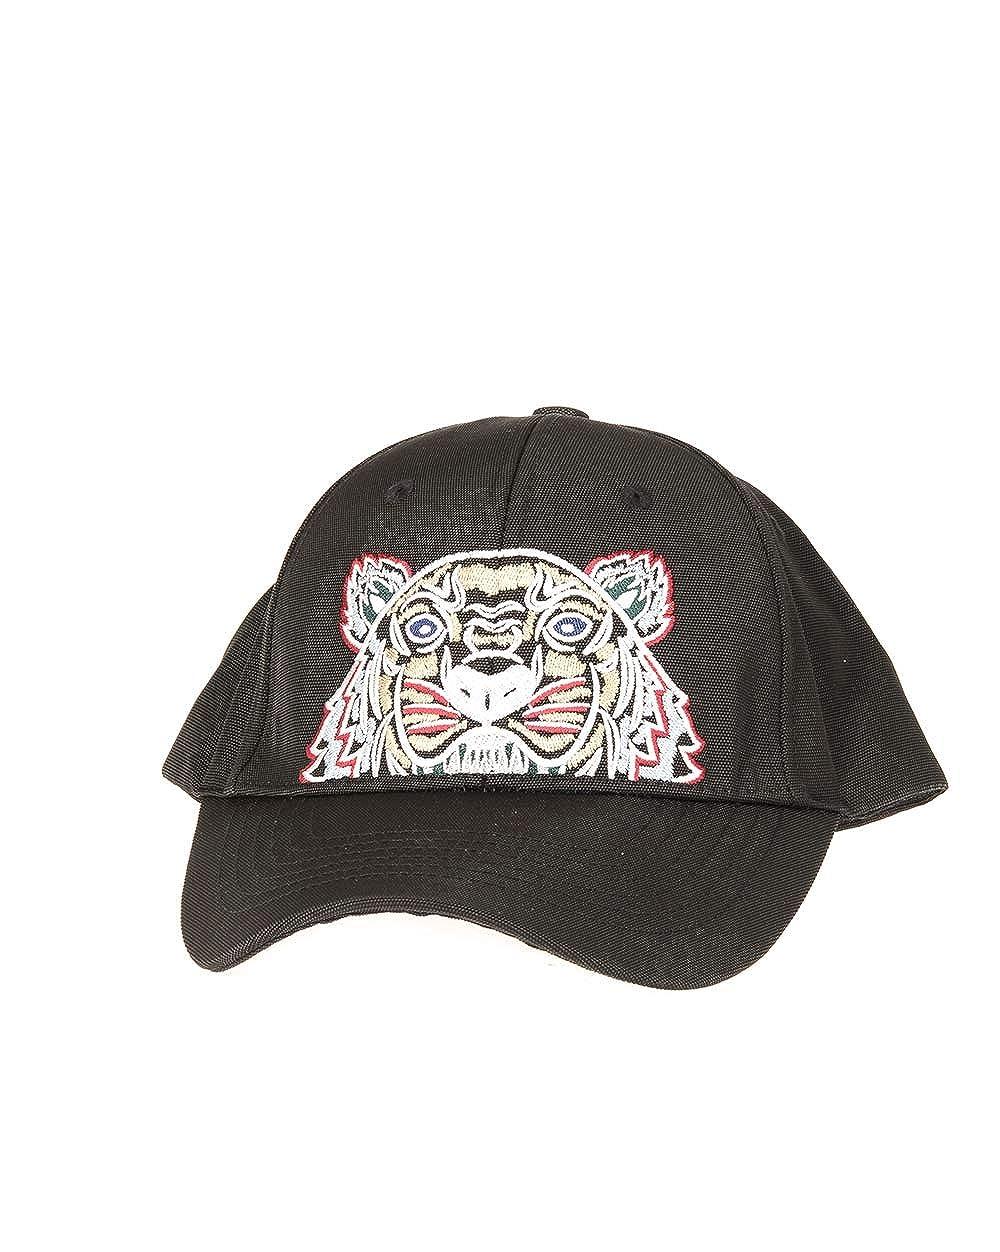 cc0e6ae3 Kenzo Mens Tiger Baseball Cap Black at Amazon Men's Clothing store